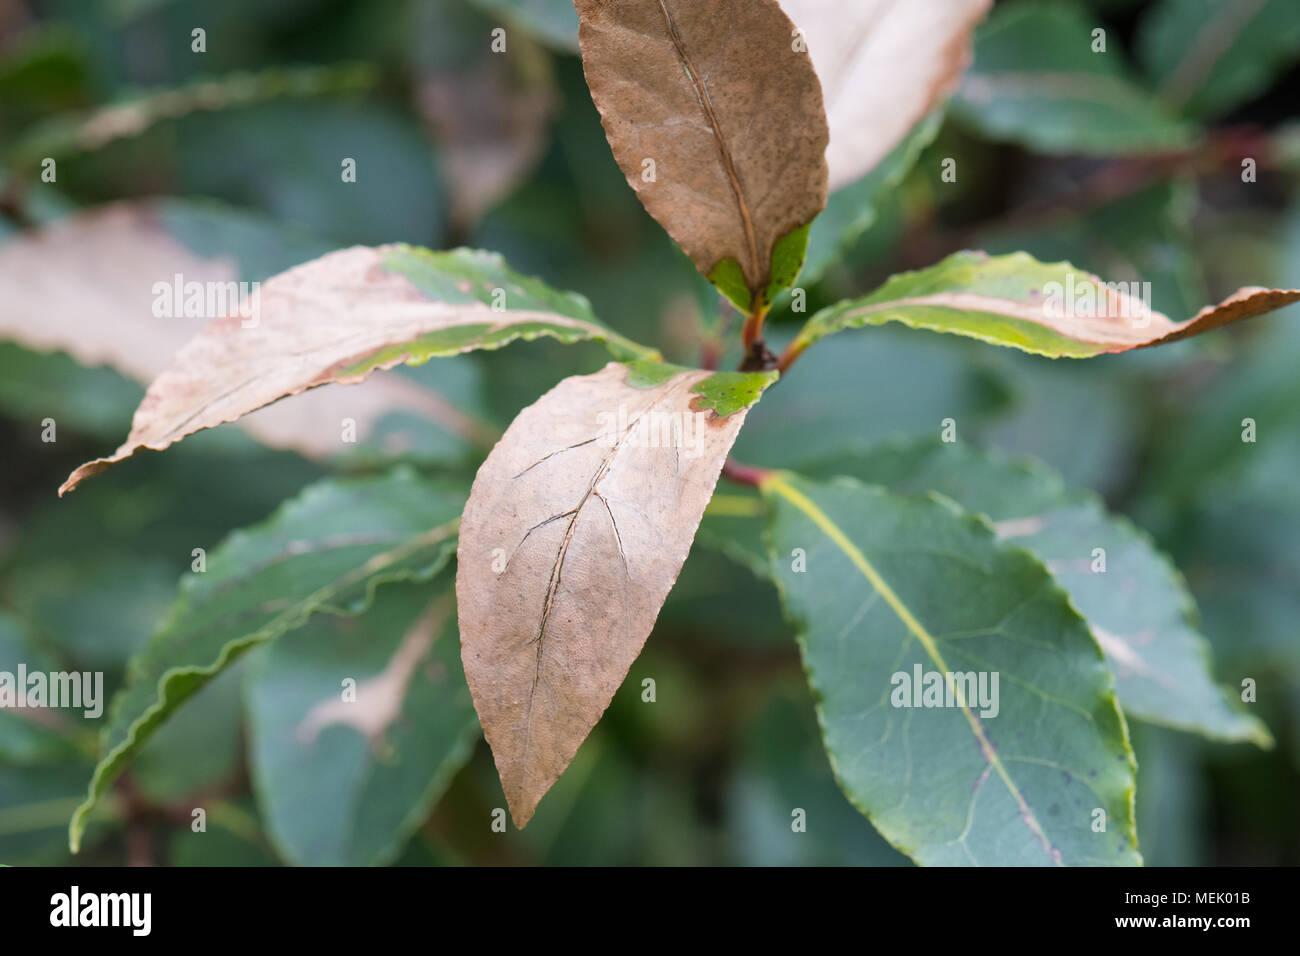 Lorbeerblätter - Bay Lorbeer (Laurus nobilis) Pflanze mit Frost Kälte Schäden an Blättern in de Garten Stockbild